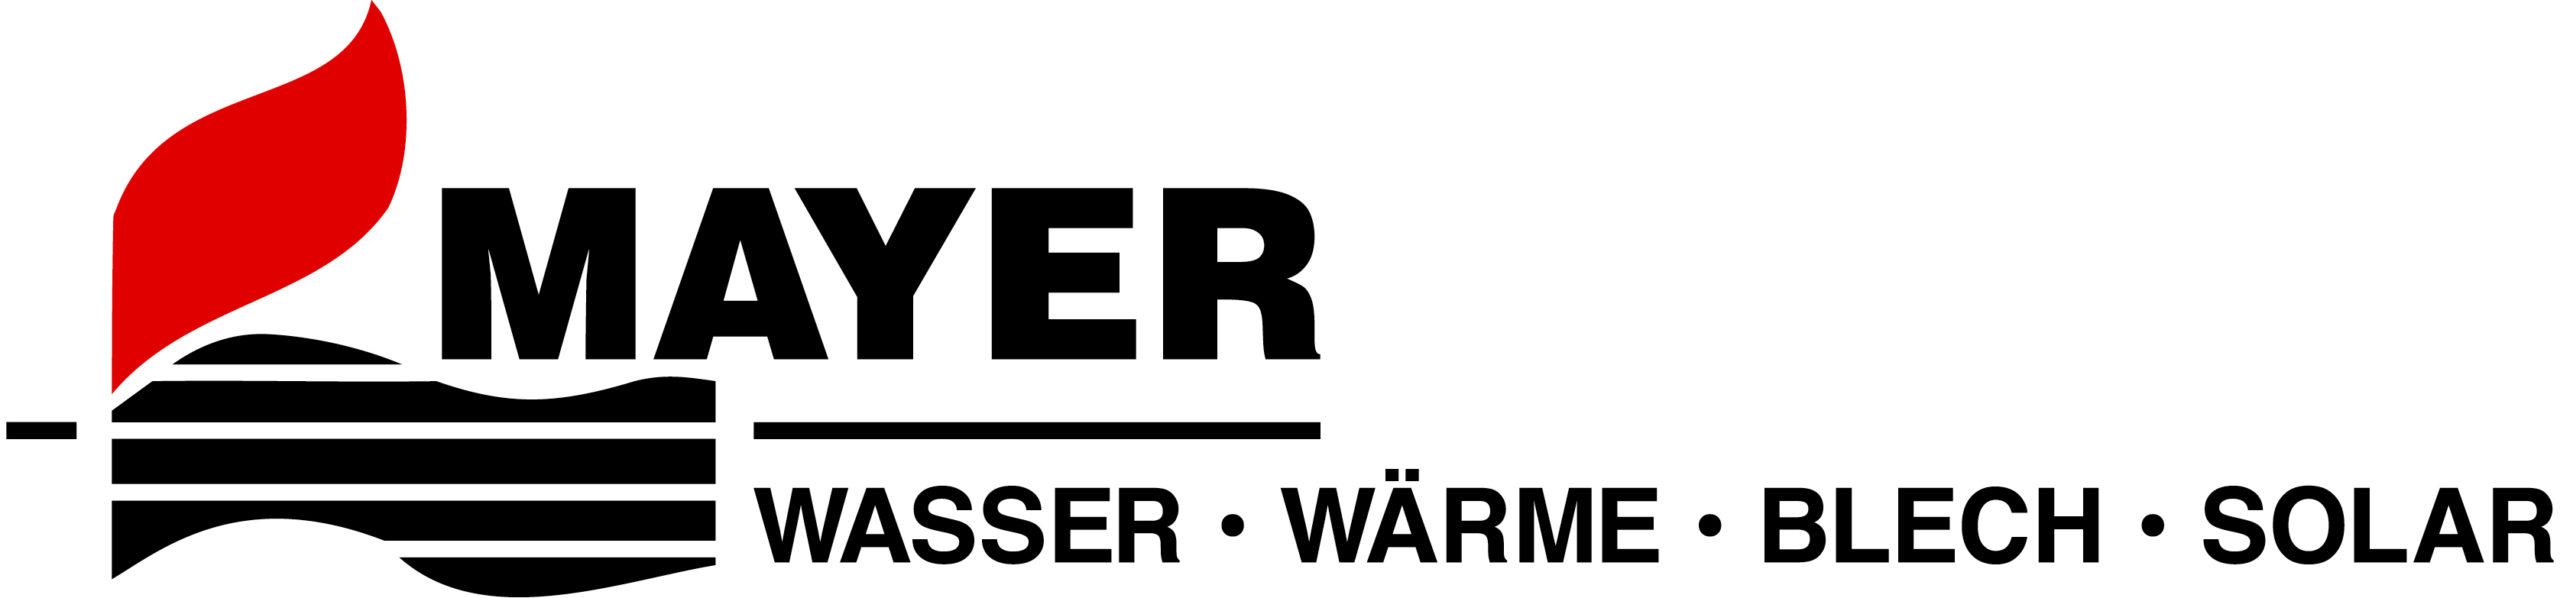 Mayer Haustechnik | Wasser Wärme Blech Solar | Isny Argenbühl